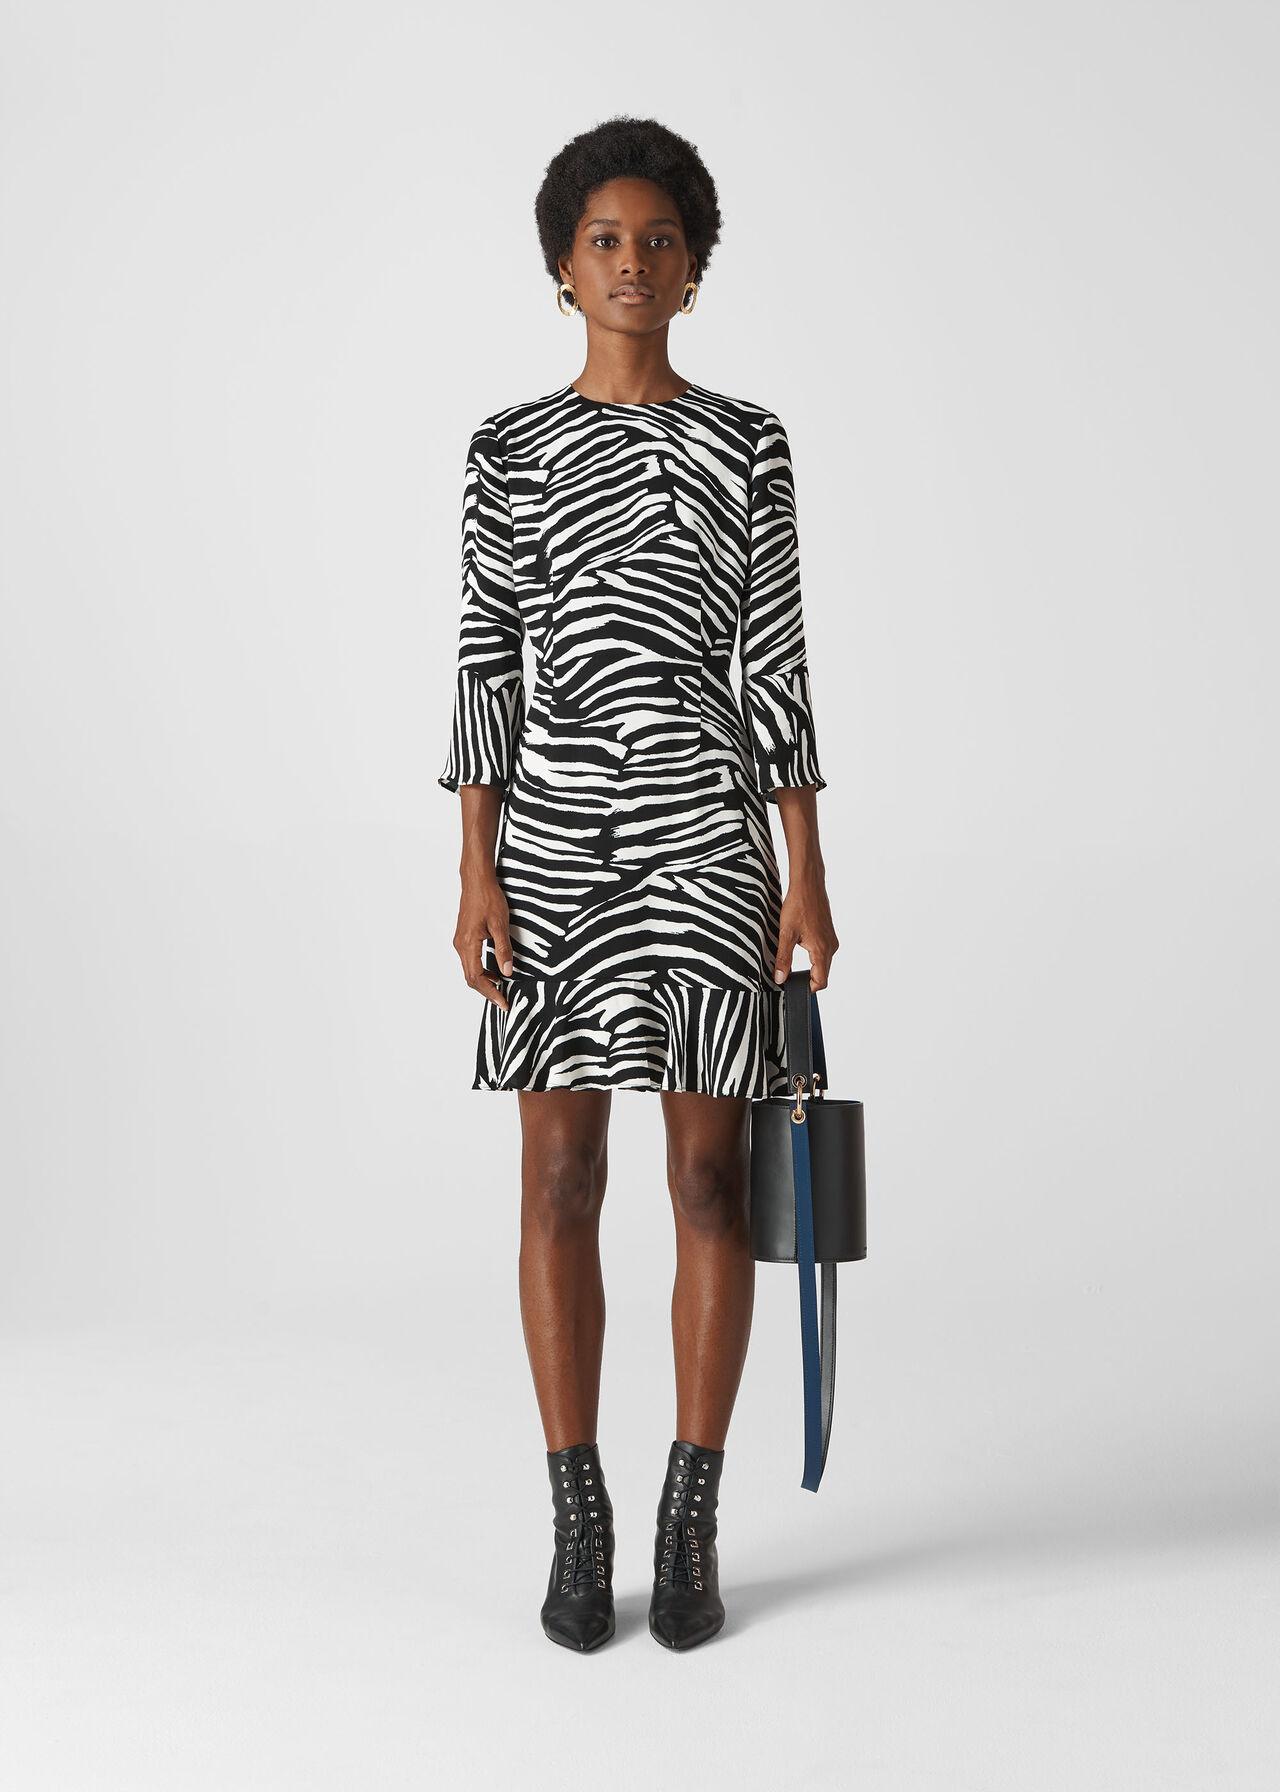 Zebra Print Flippy Dress Black/White